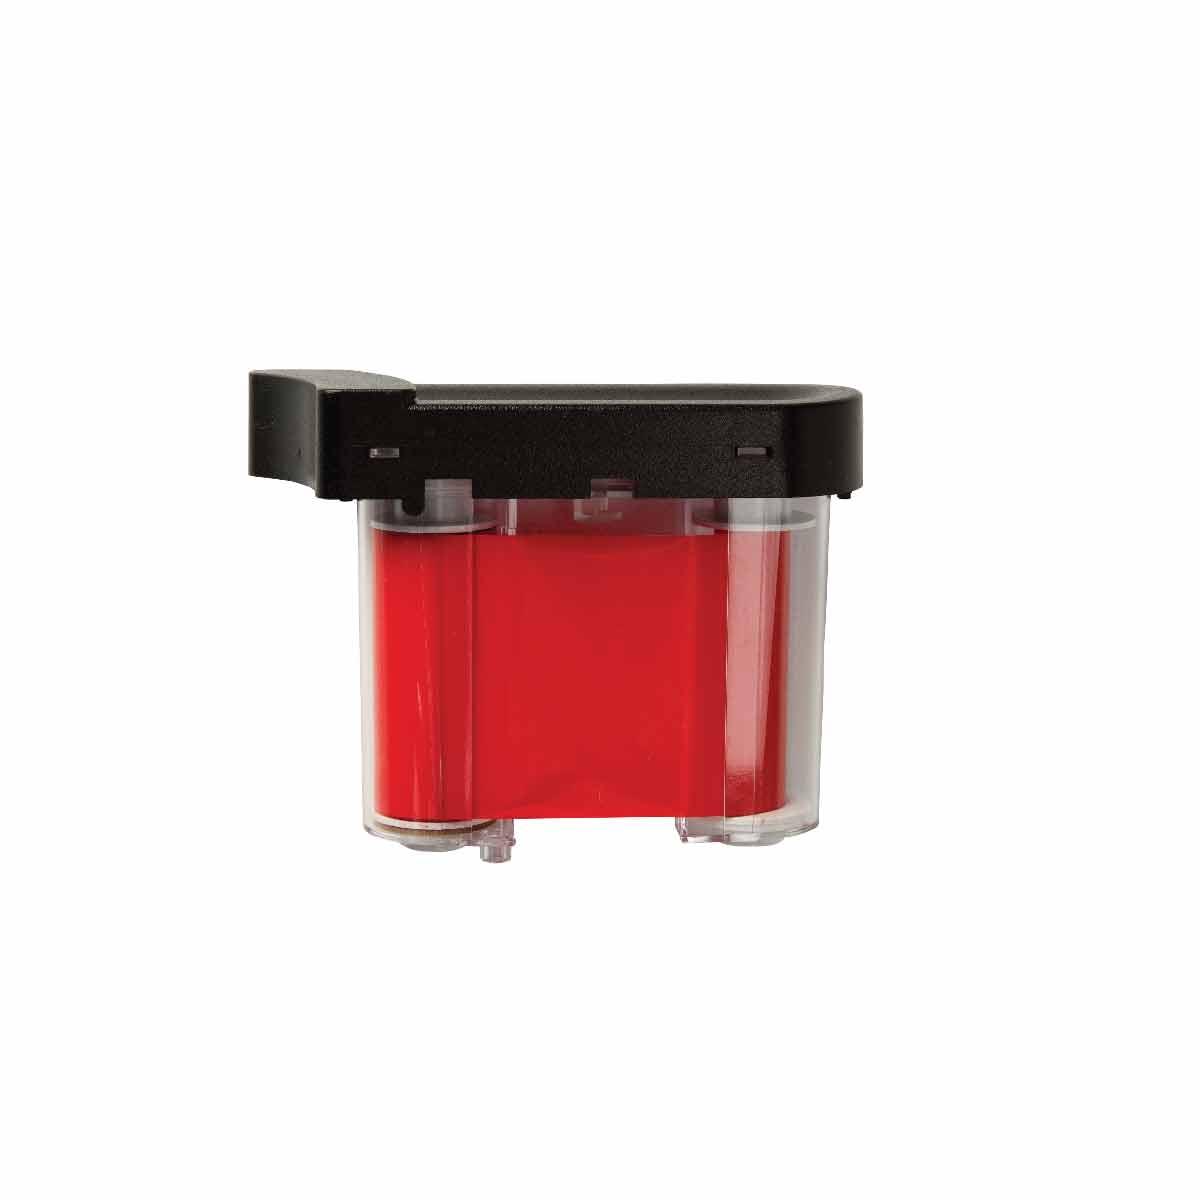 BRADY 42013 Red 2 In 75 Ft MarkerTape